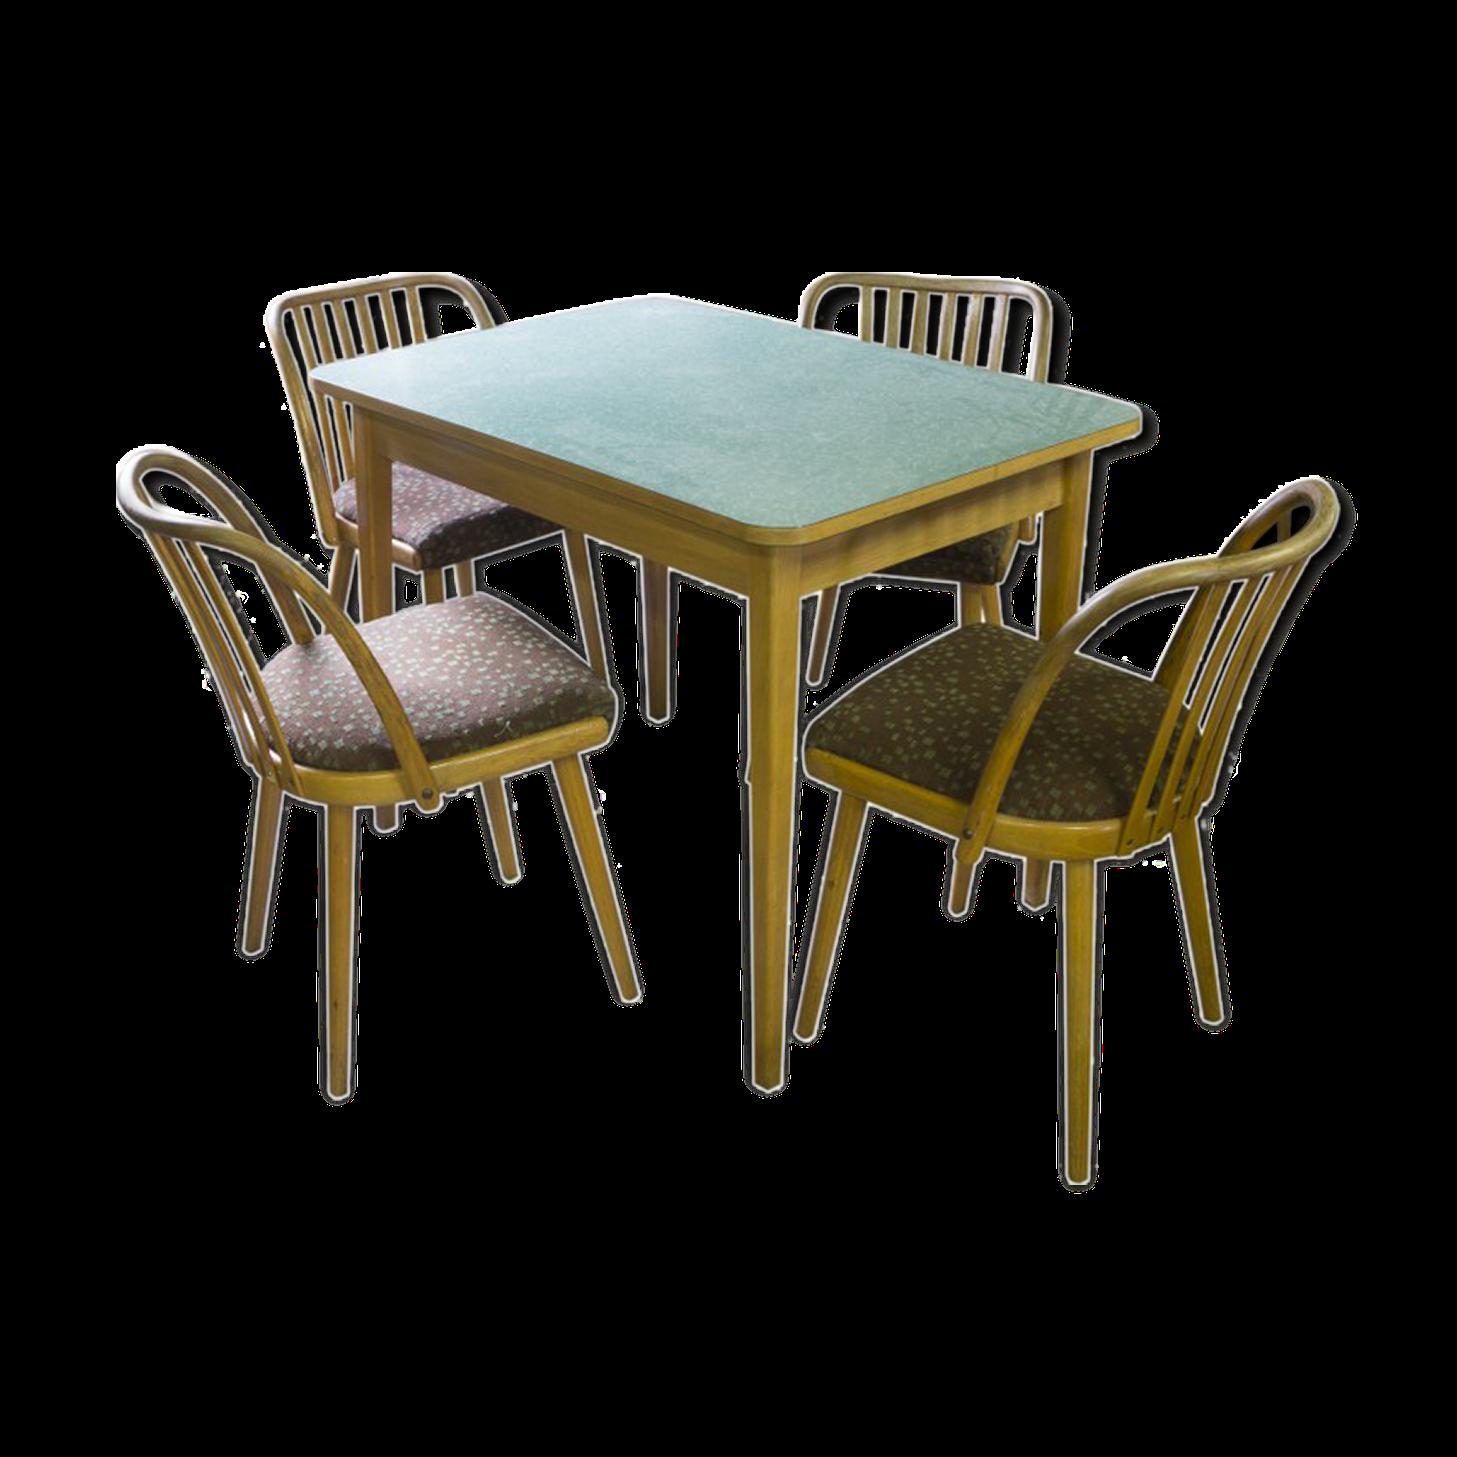 table salle manger pliante amazing table de cuisine ronde pliante with table salle manger. Black Bedroom Furniture Sets. Home Design Ideas